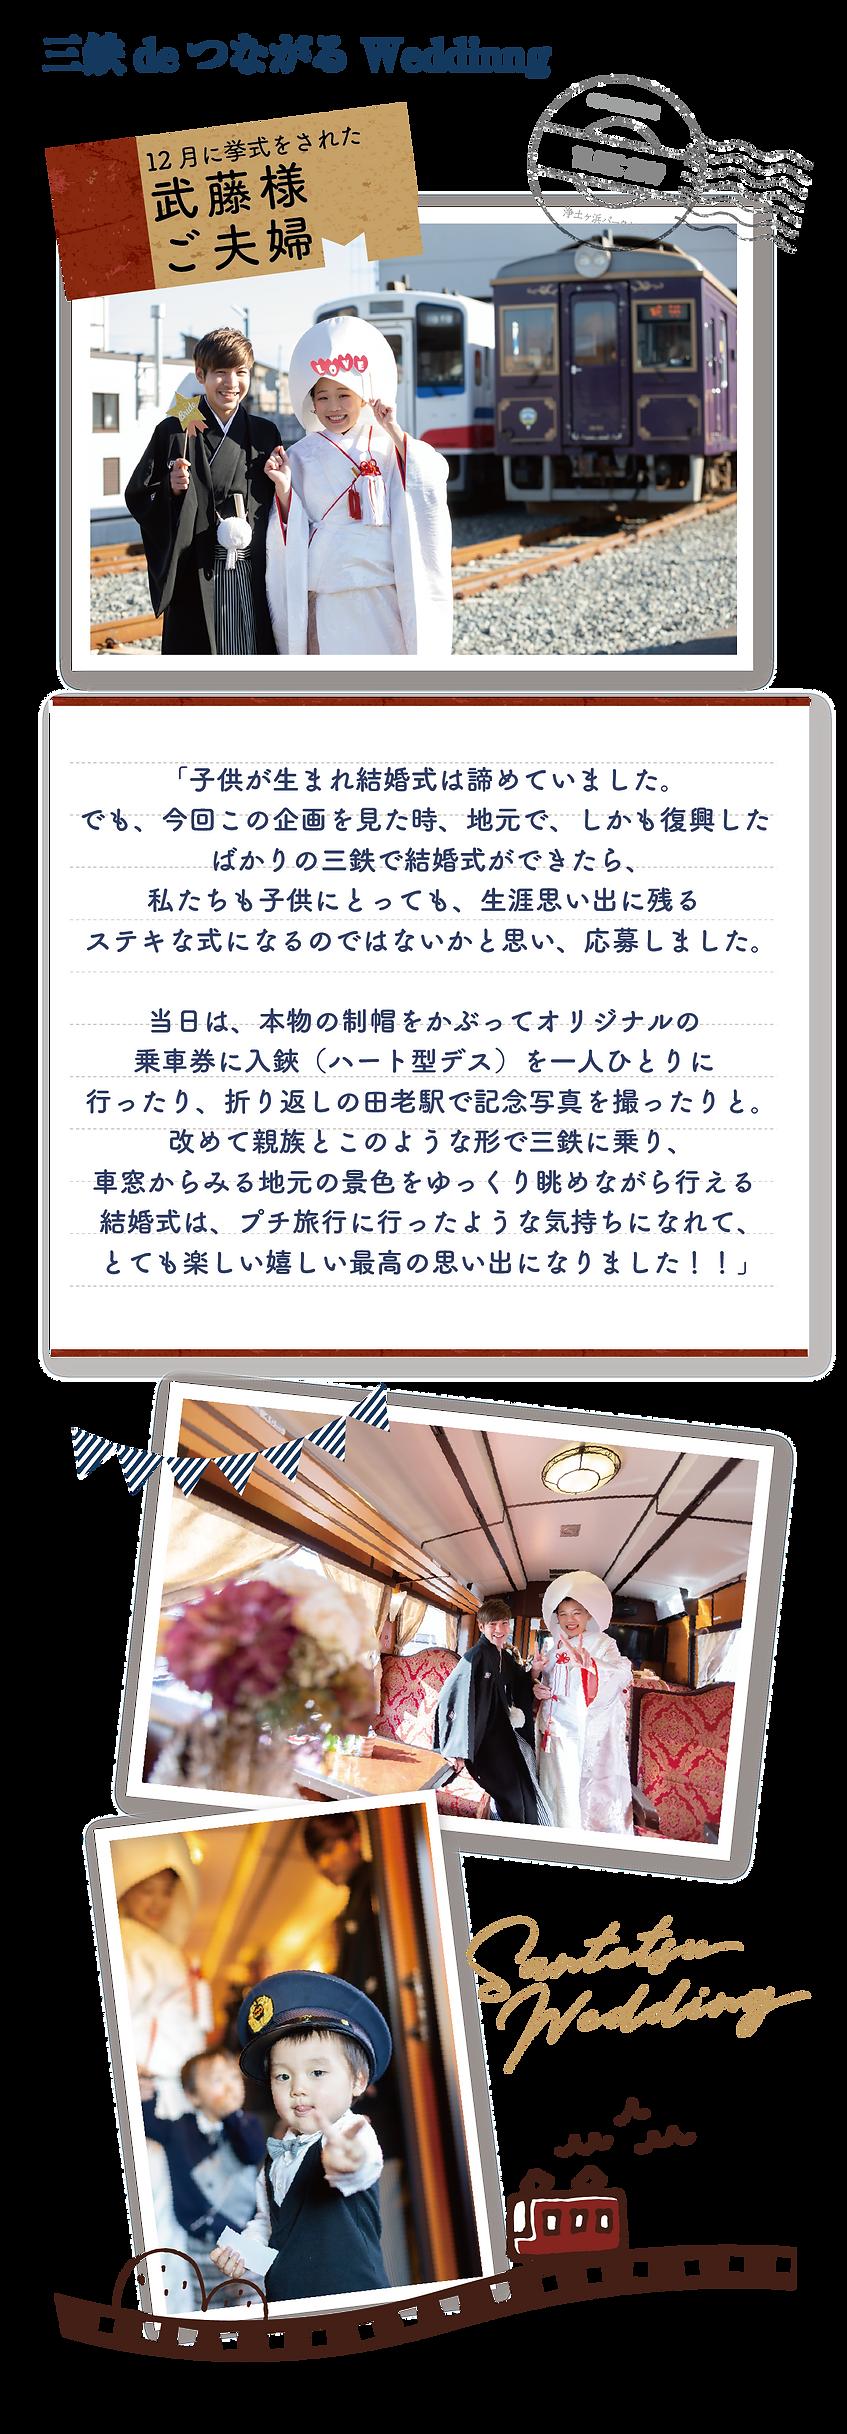 三鉄LP素材-01.png